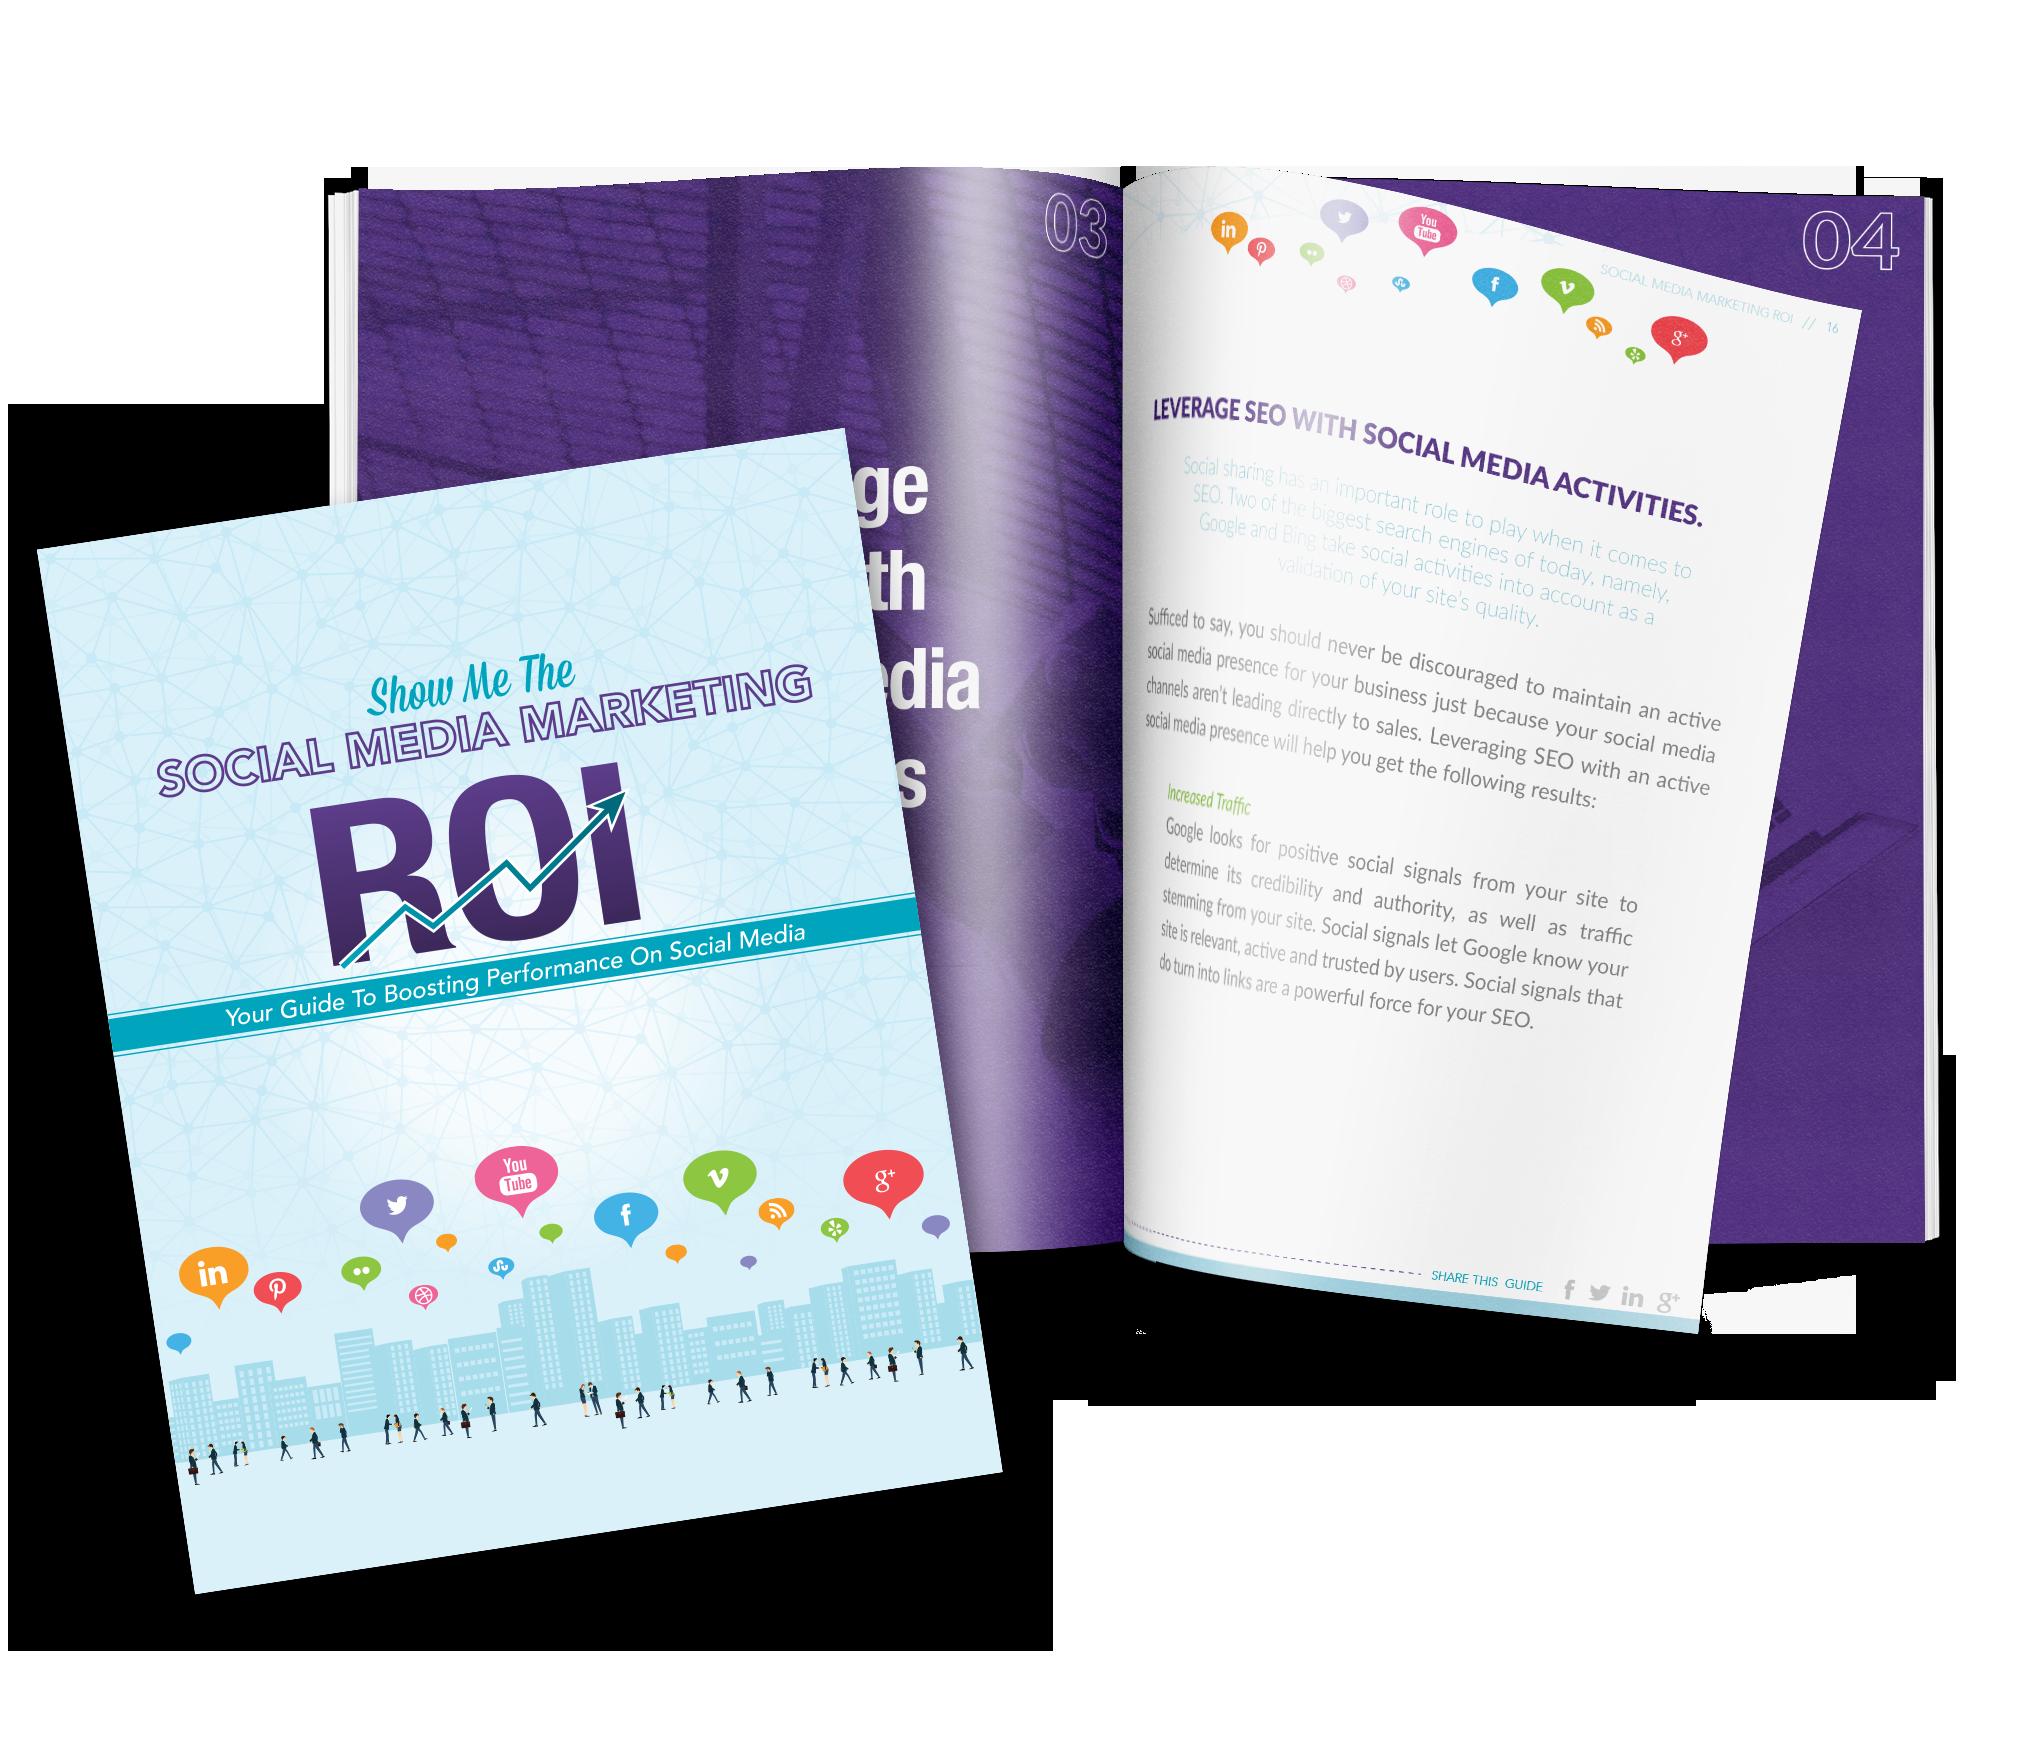 Social Media Marketing ROI Guide